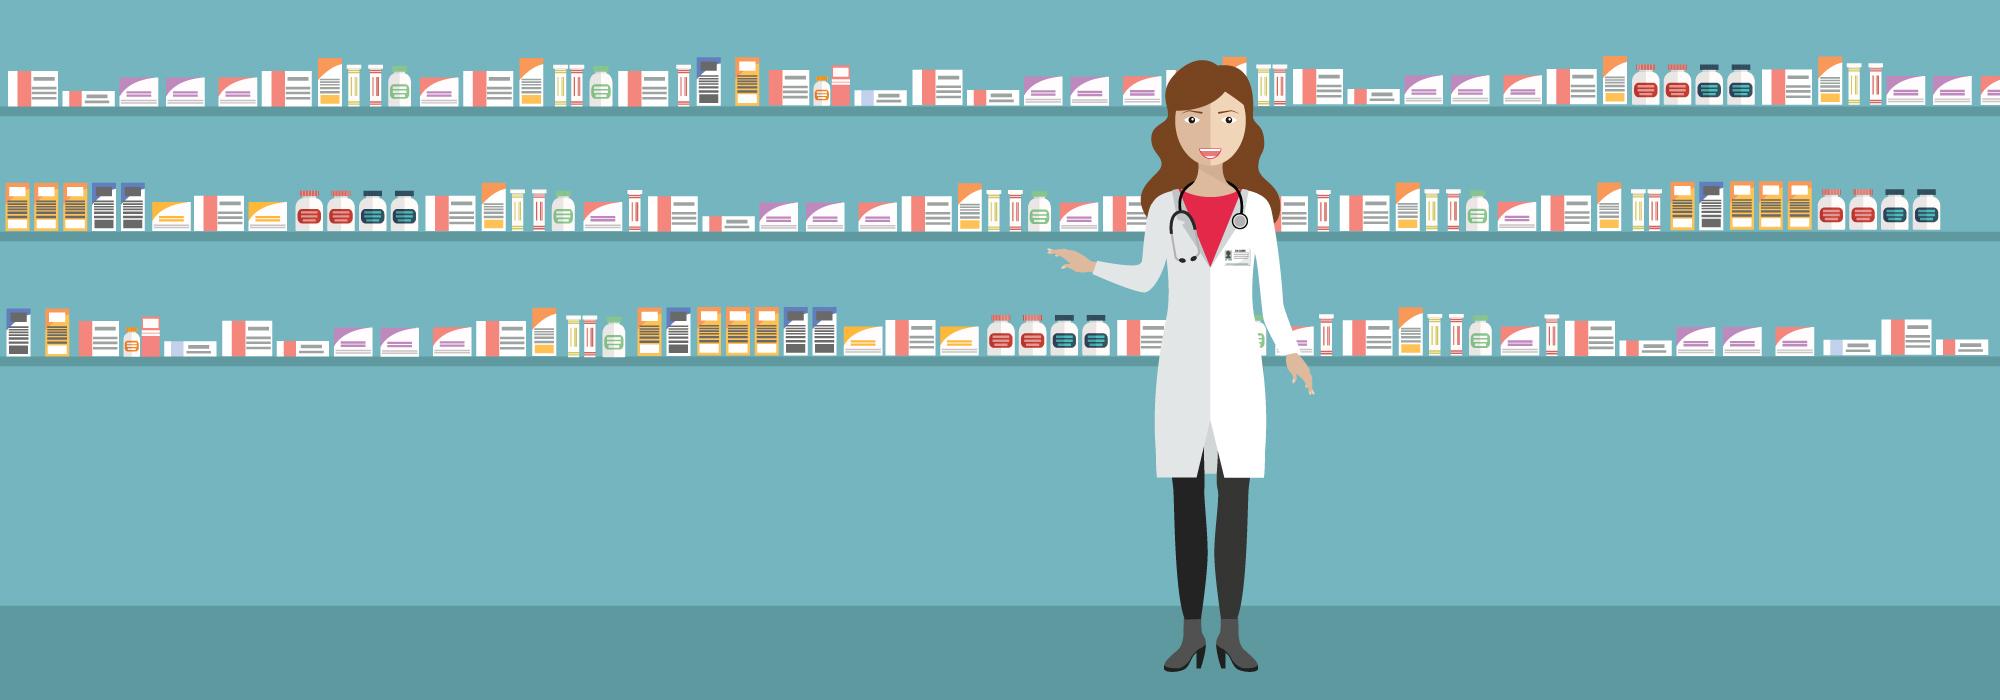 Bargoed Pharmacy Pharmacist Medicines